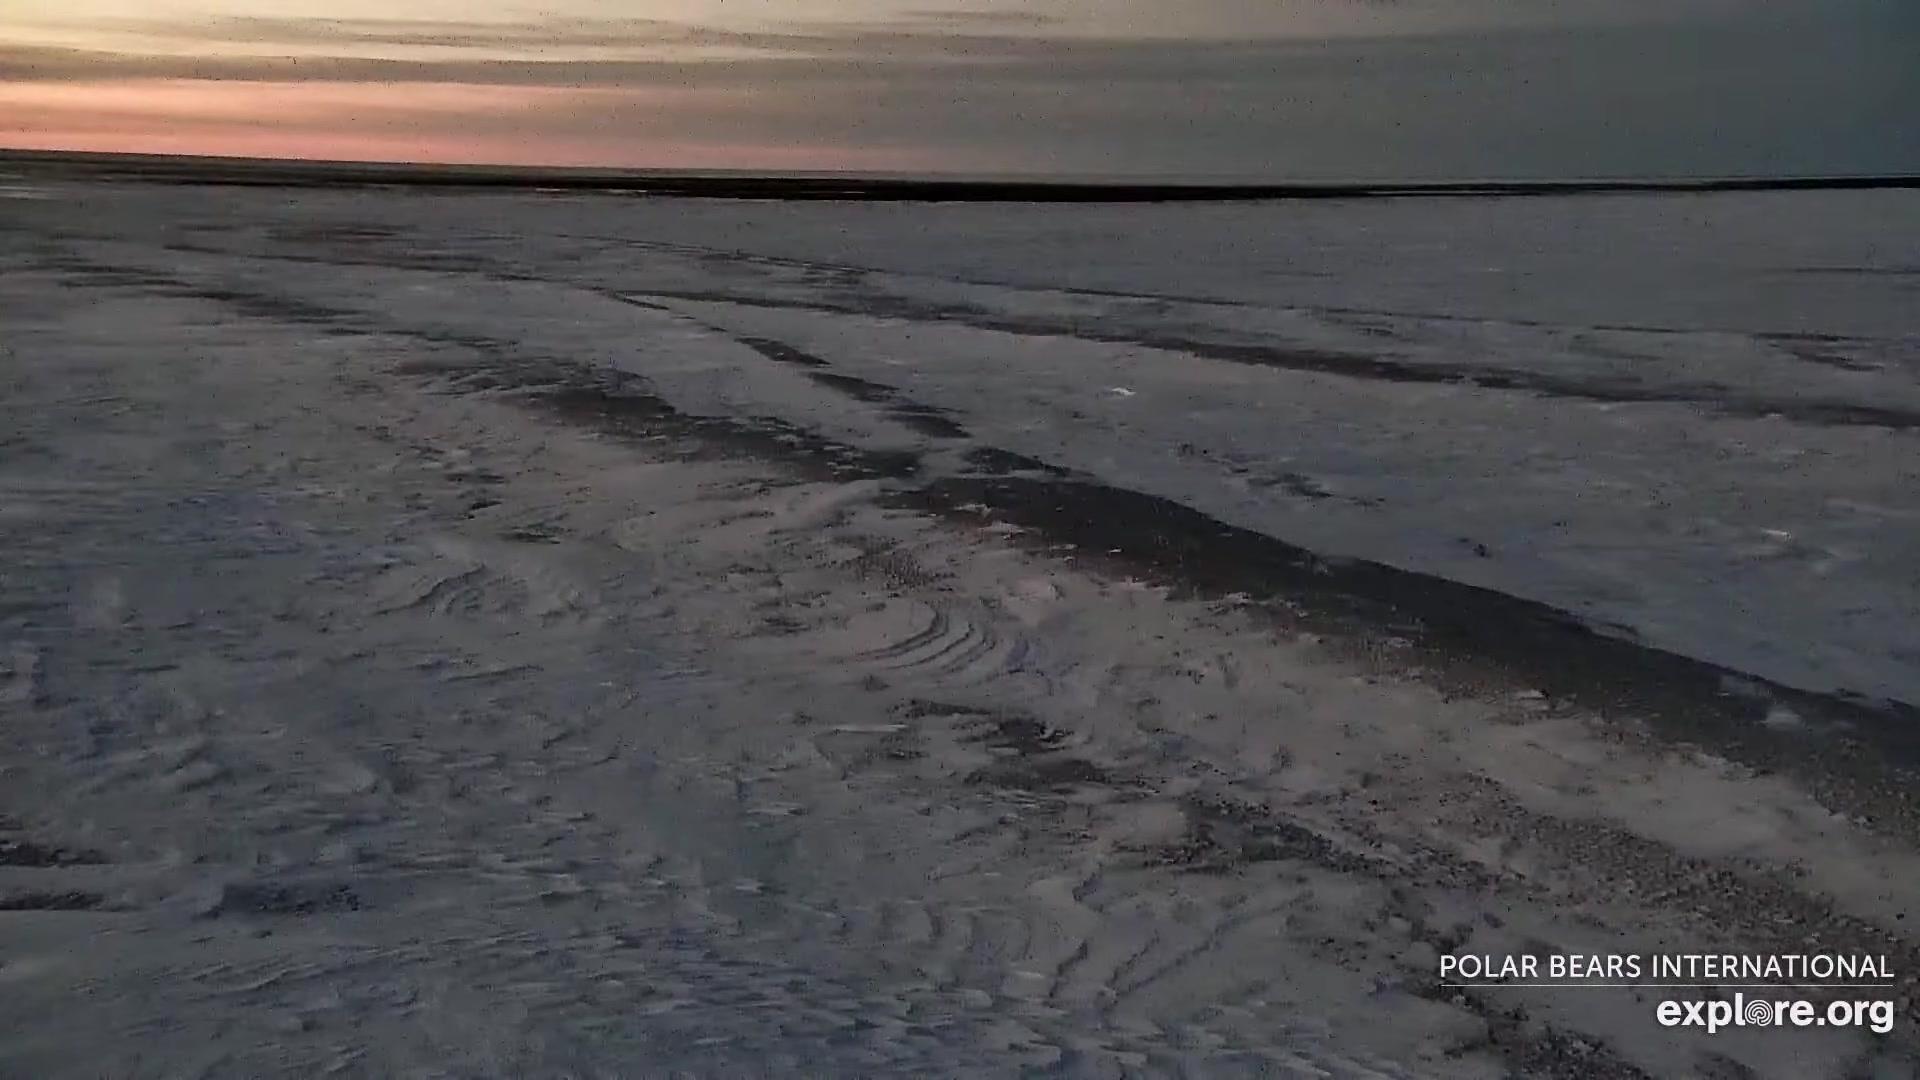 Manitoba: Wapusk National Park